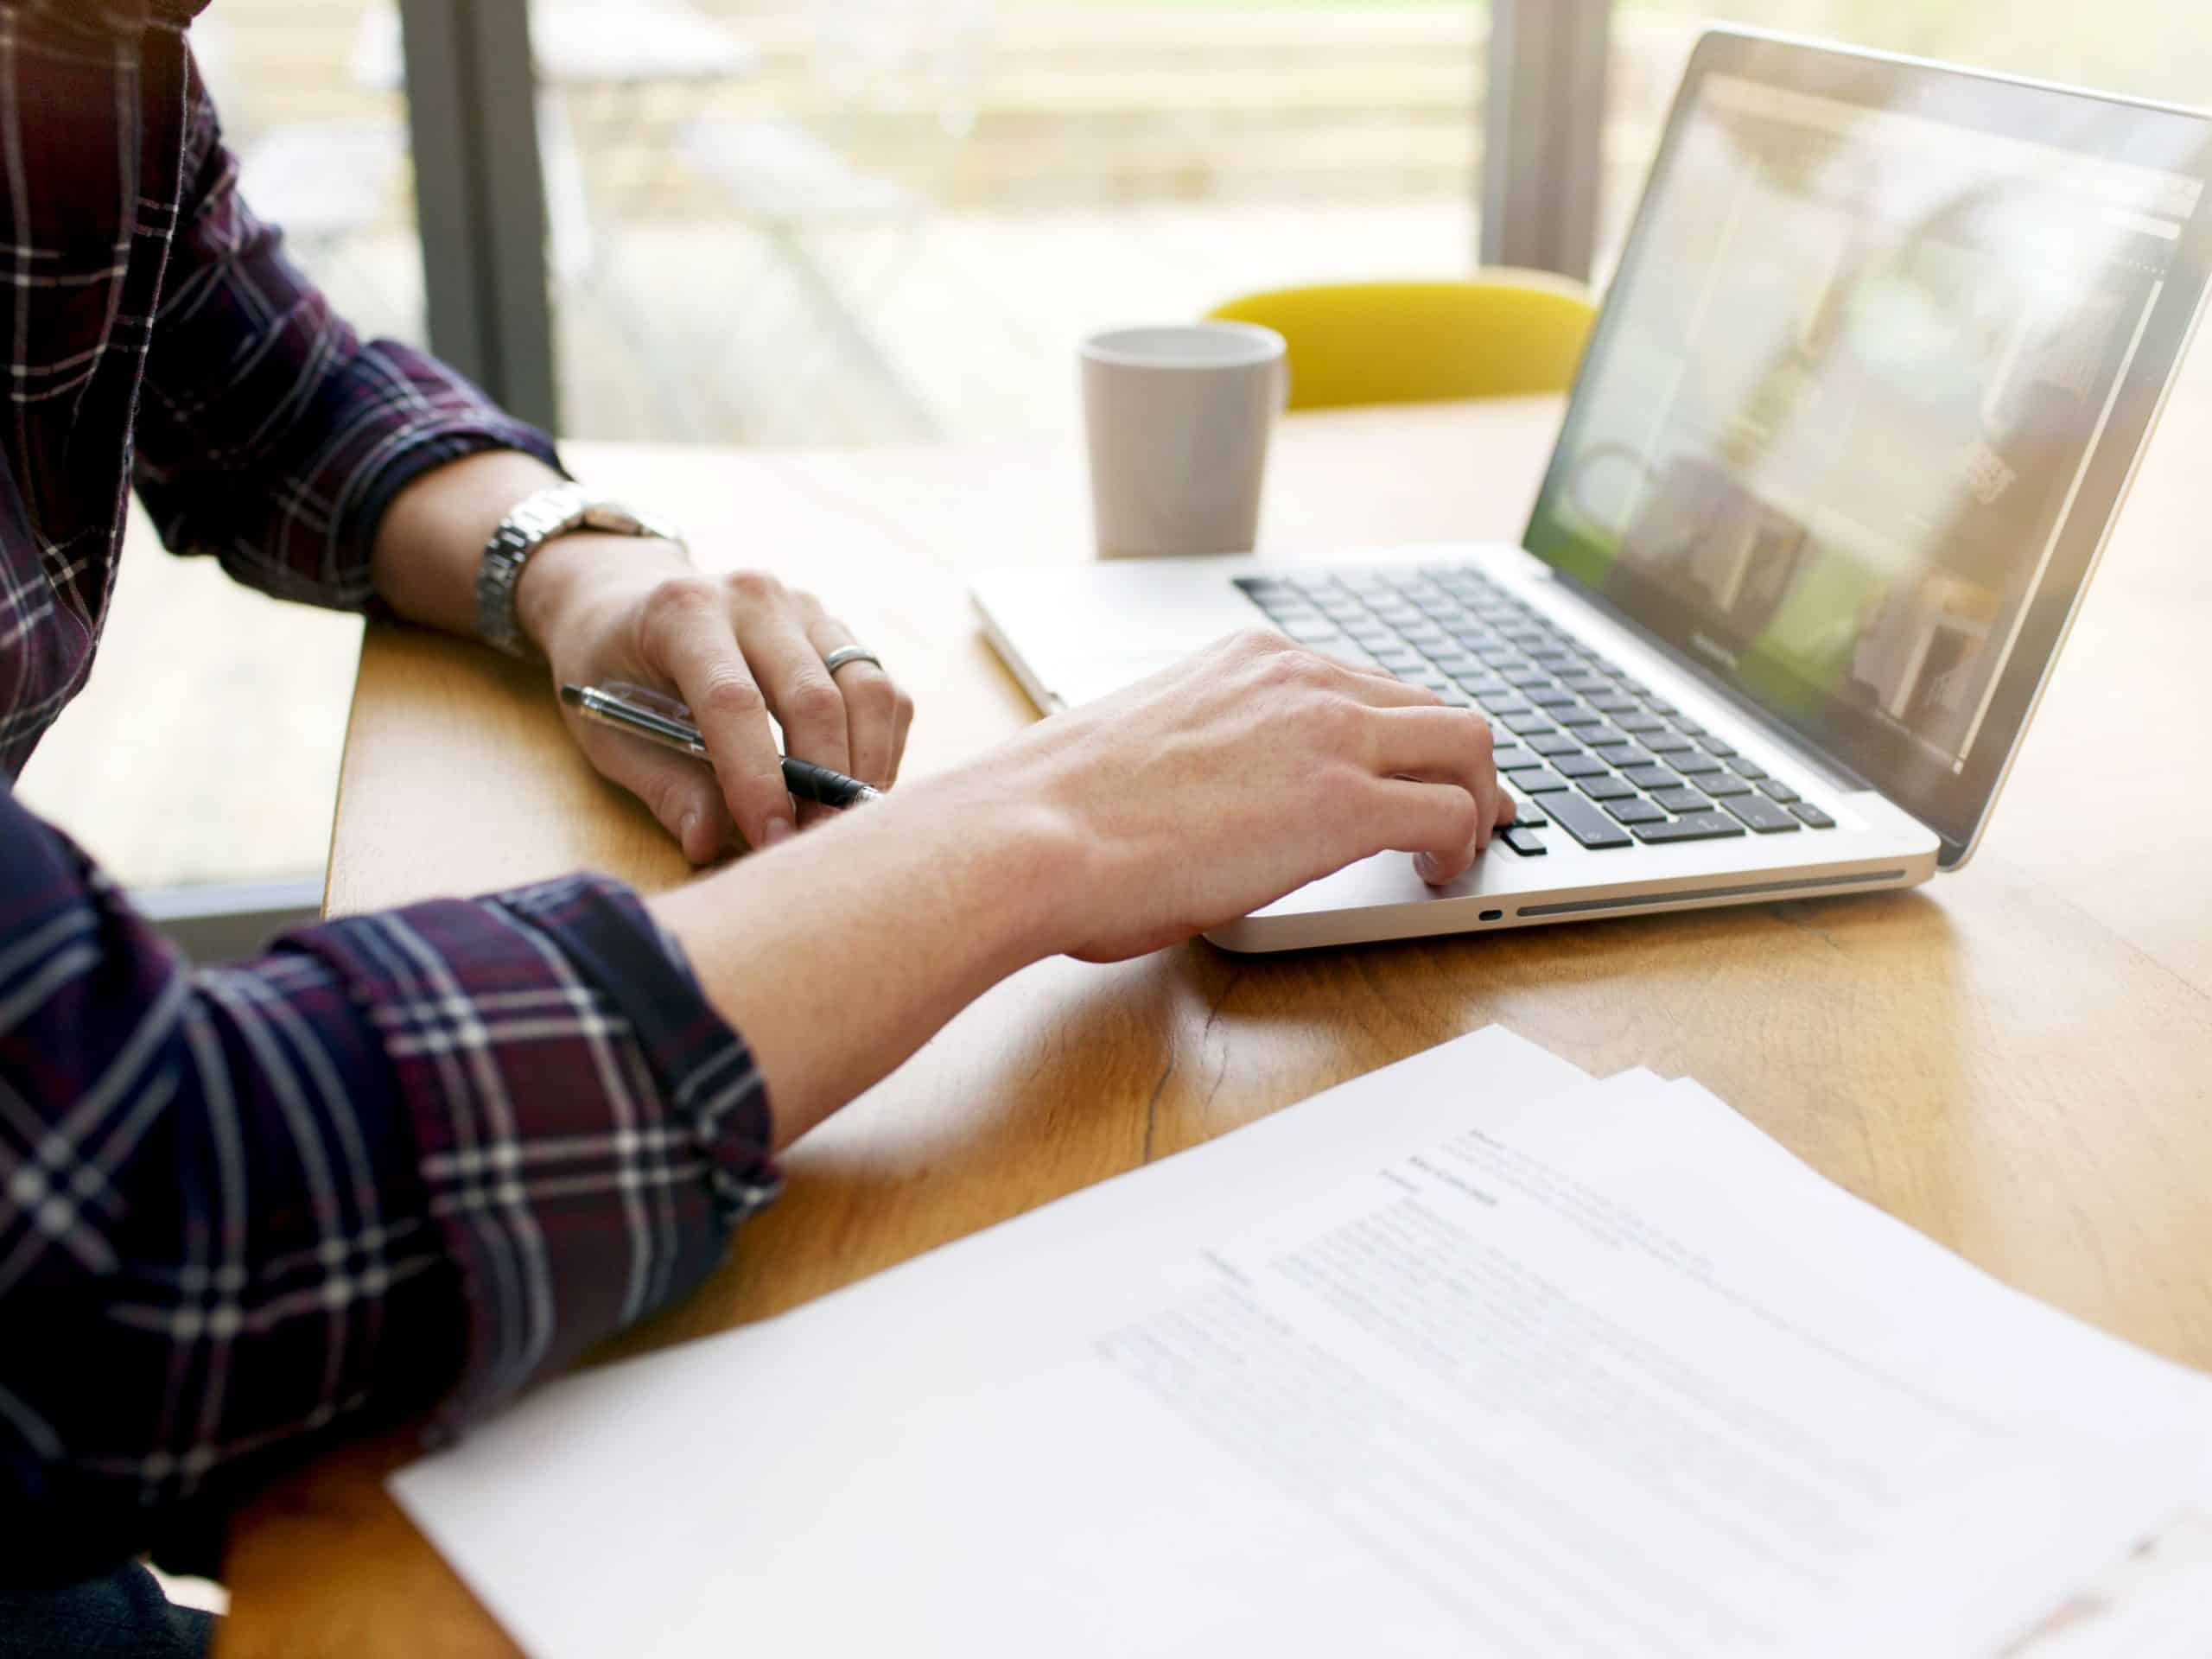 5+ Contoh Proposal Lengkap Kegiatan Sekolah, Usaha, dll (Terbaru)